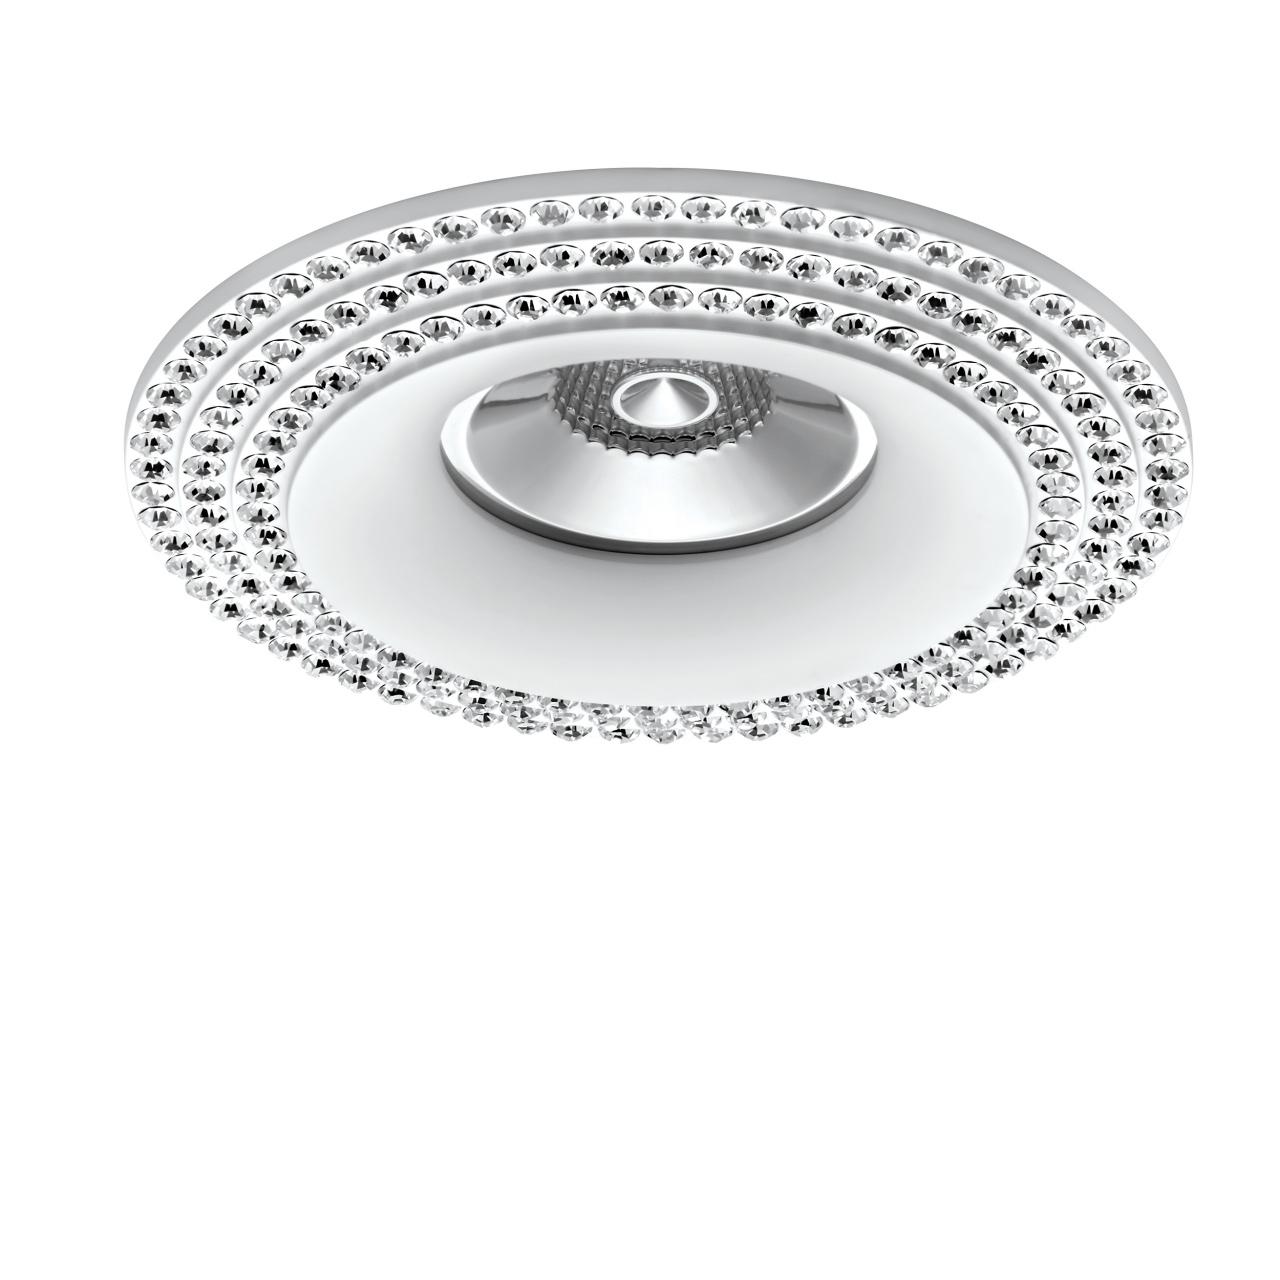 Светильник Miriade MR16 / HP16 белый Lightstar 011976